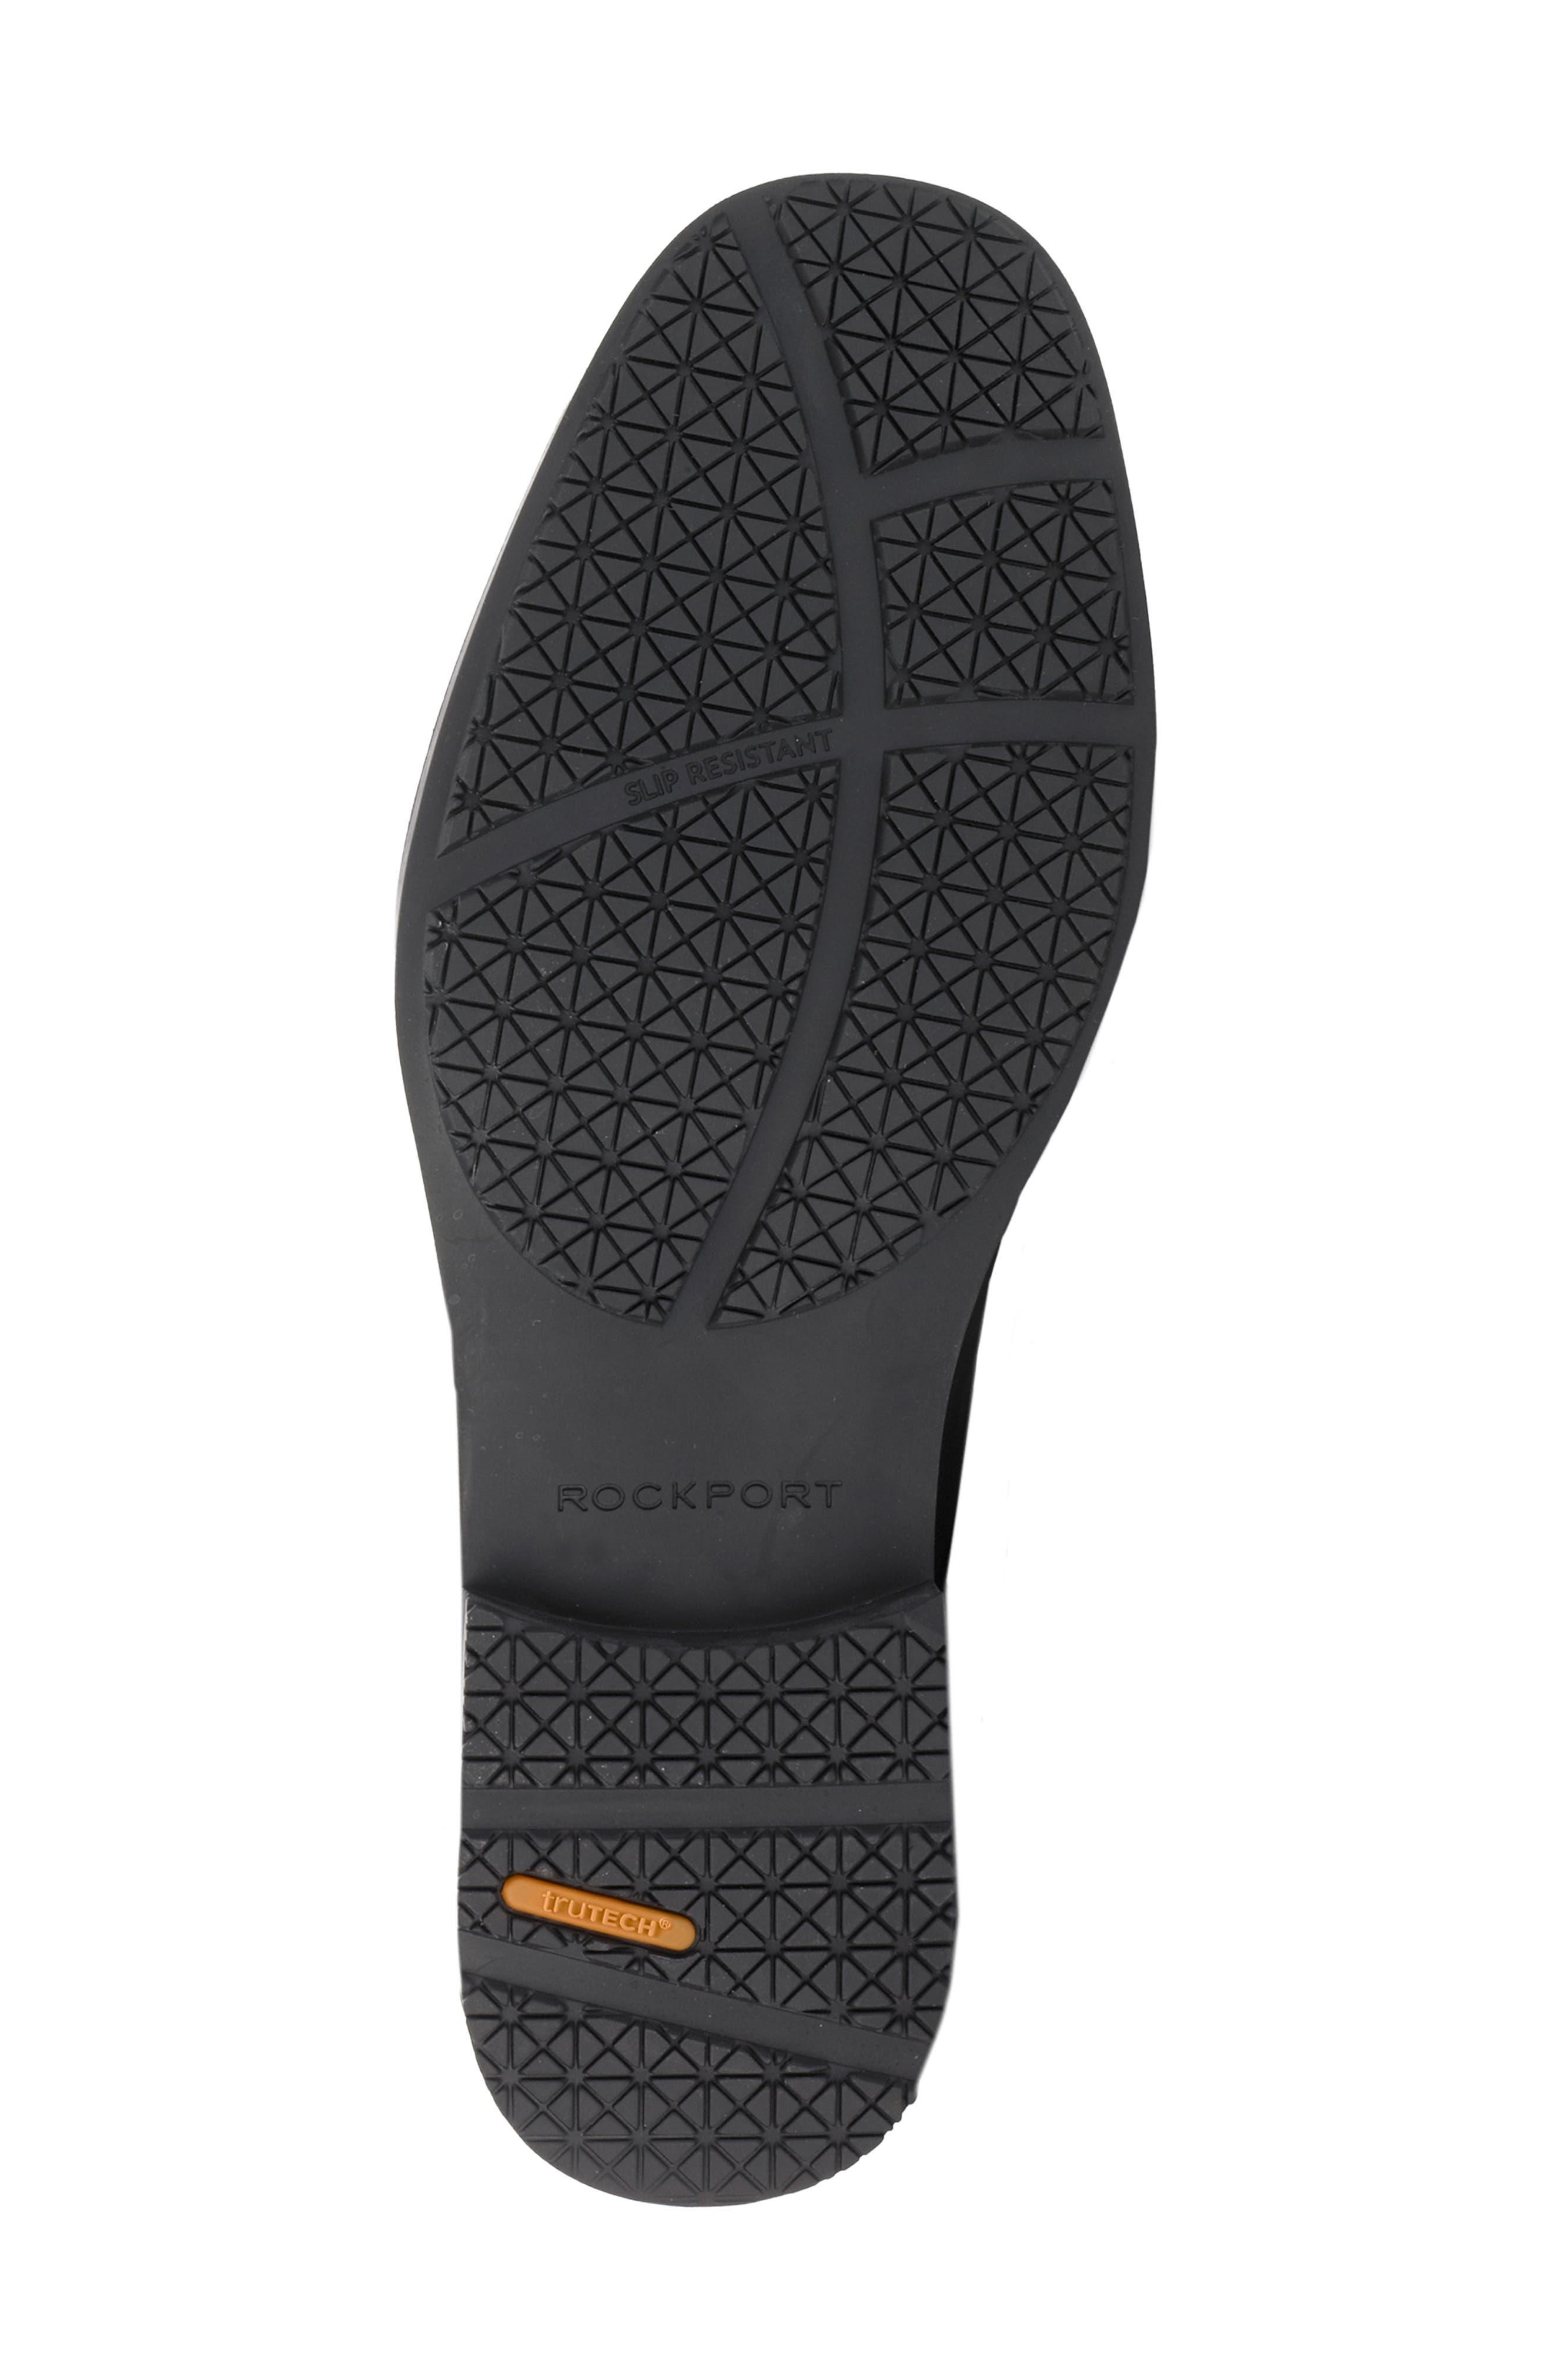 'Essential Details' Waterproof Loafer,                             Alternate thumbnail 3, color,                             BLACK